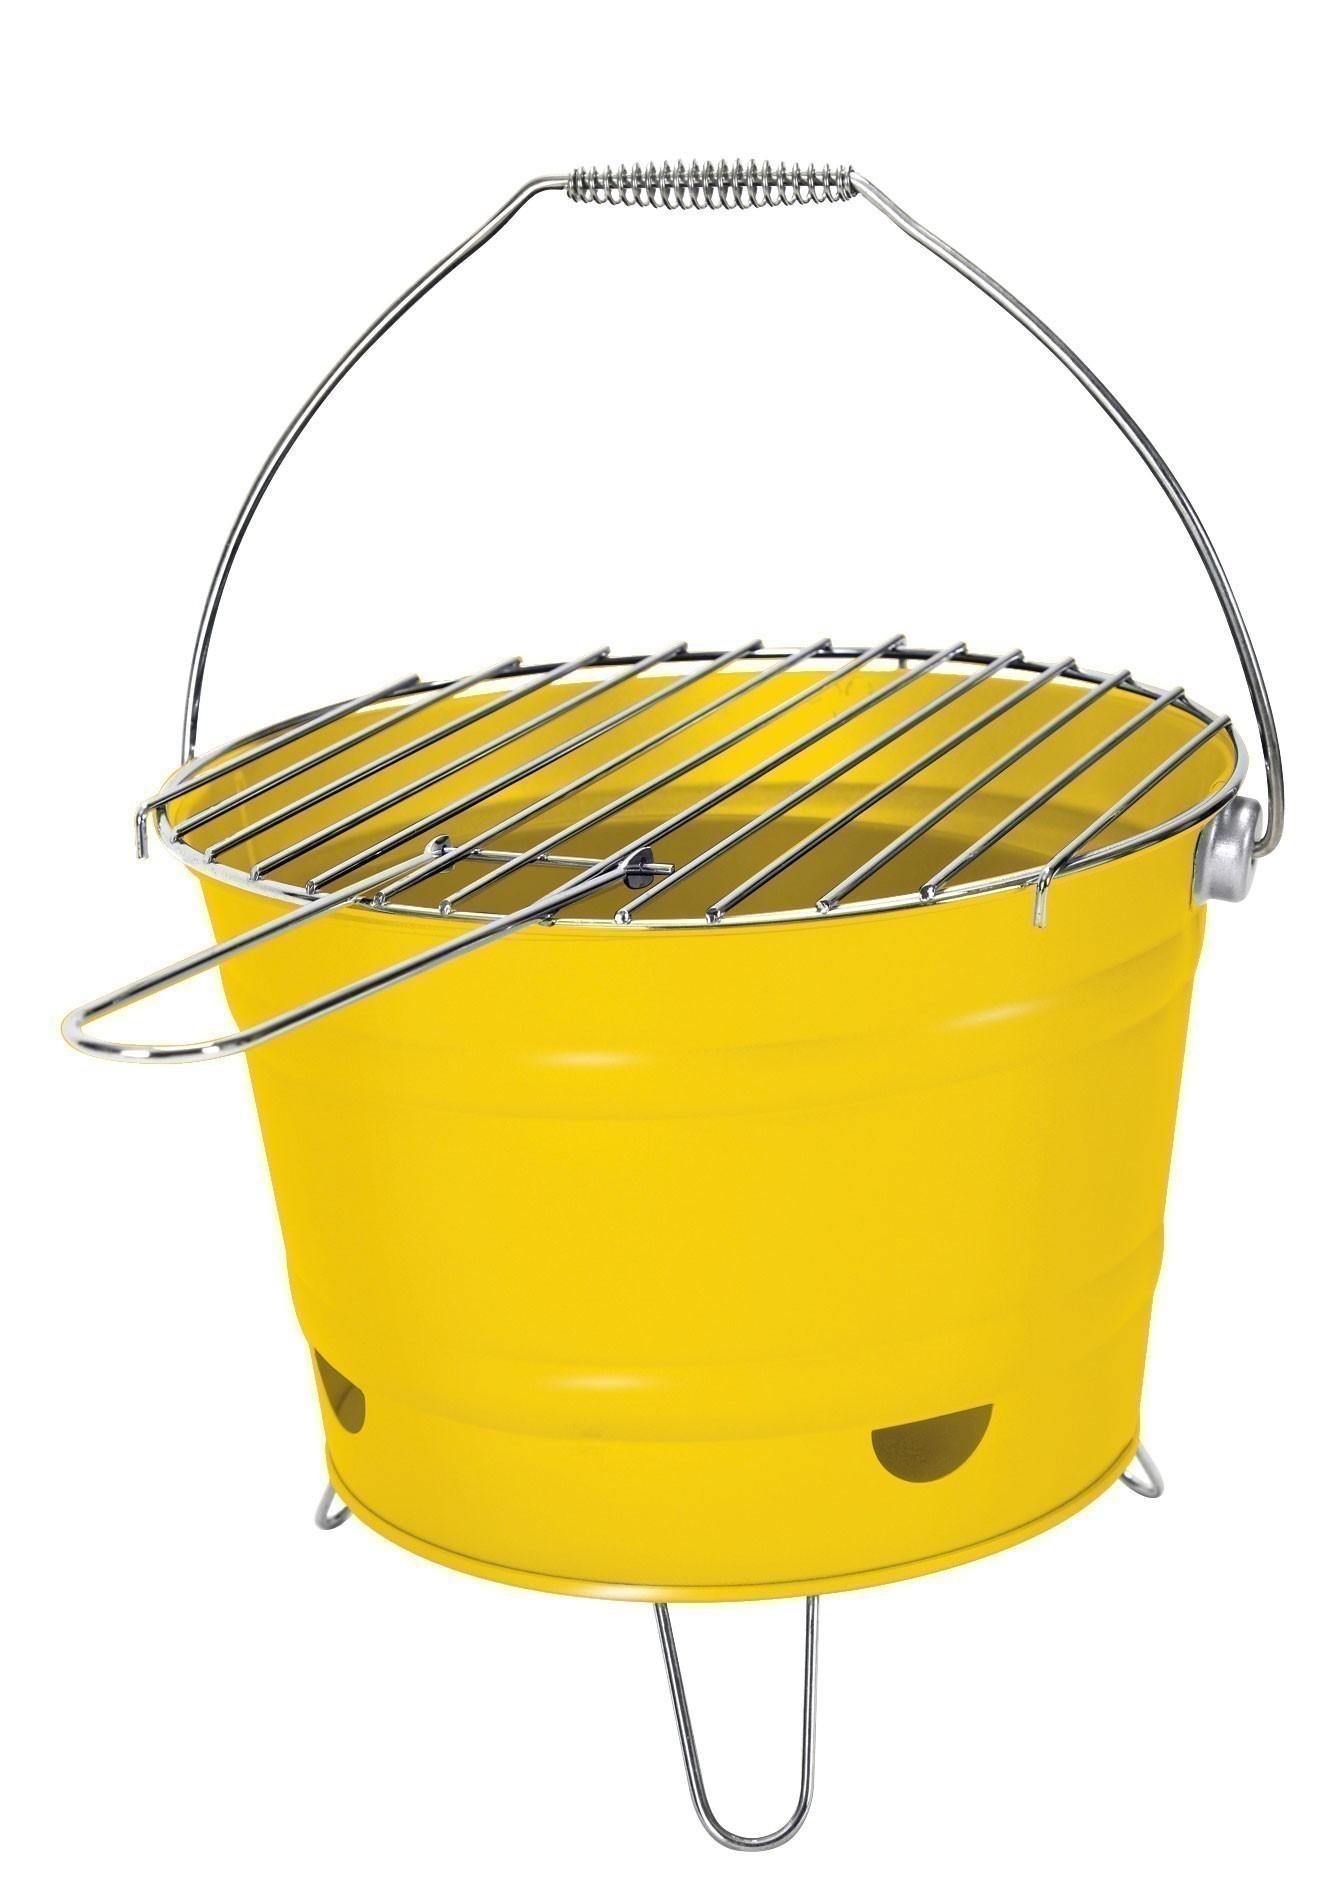 Holzkohlegrill / Grilleimer Arlington gelb Ø 27 cm Bild 1